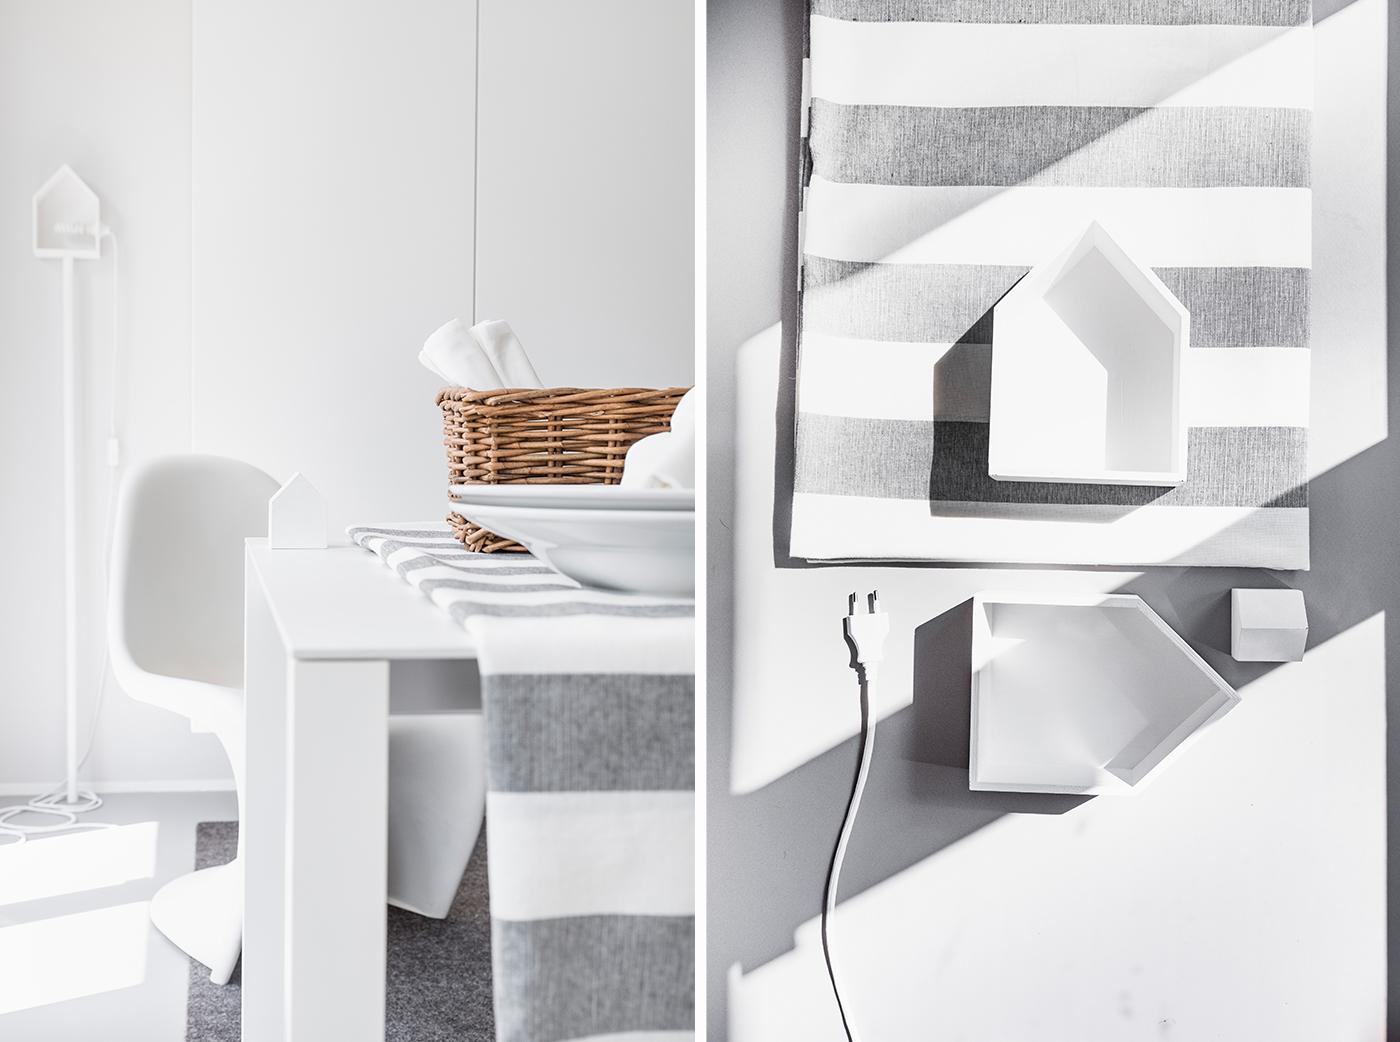 diy lampe sch n bei dir by depot. Black Bedroom Furniture Sets. Home Design Ideas